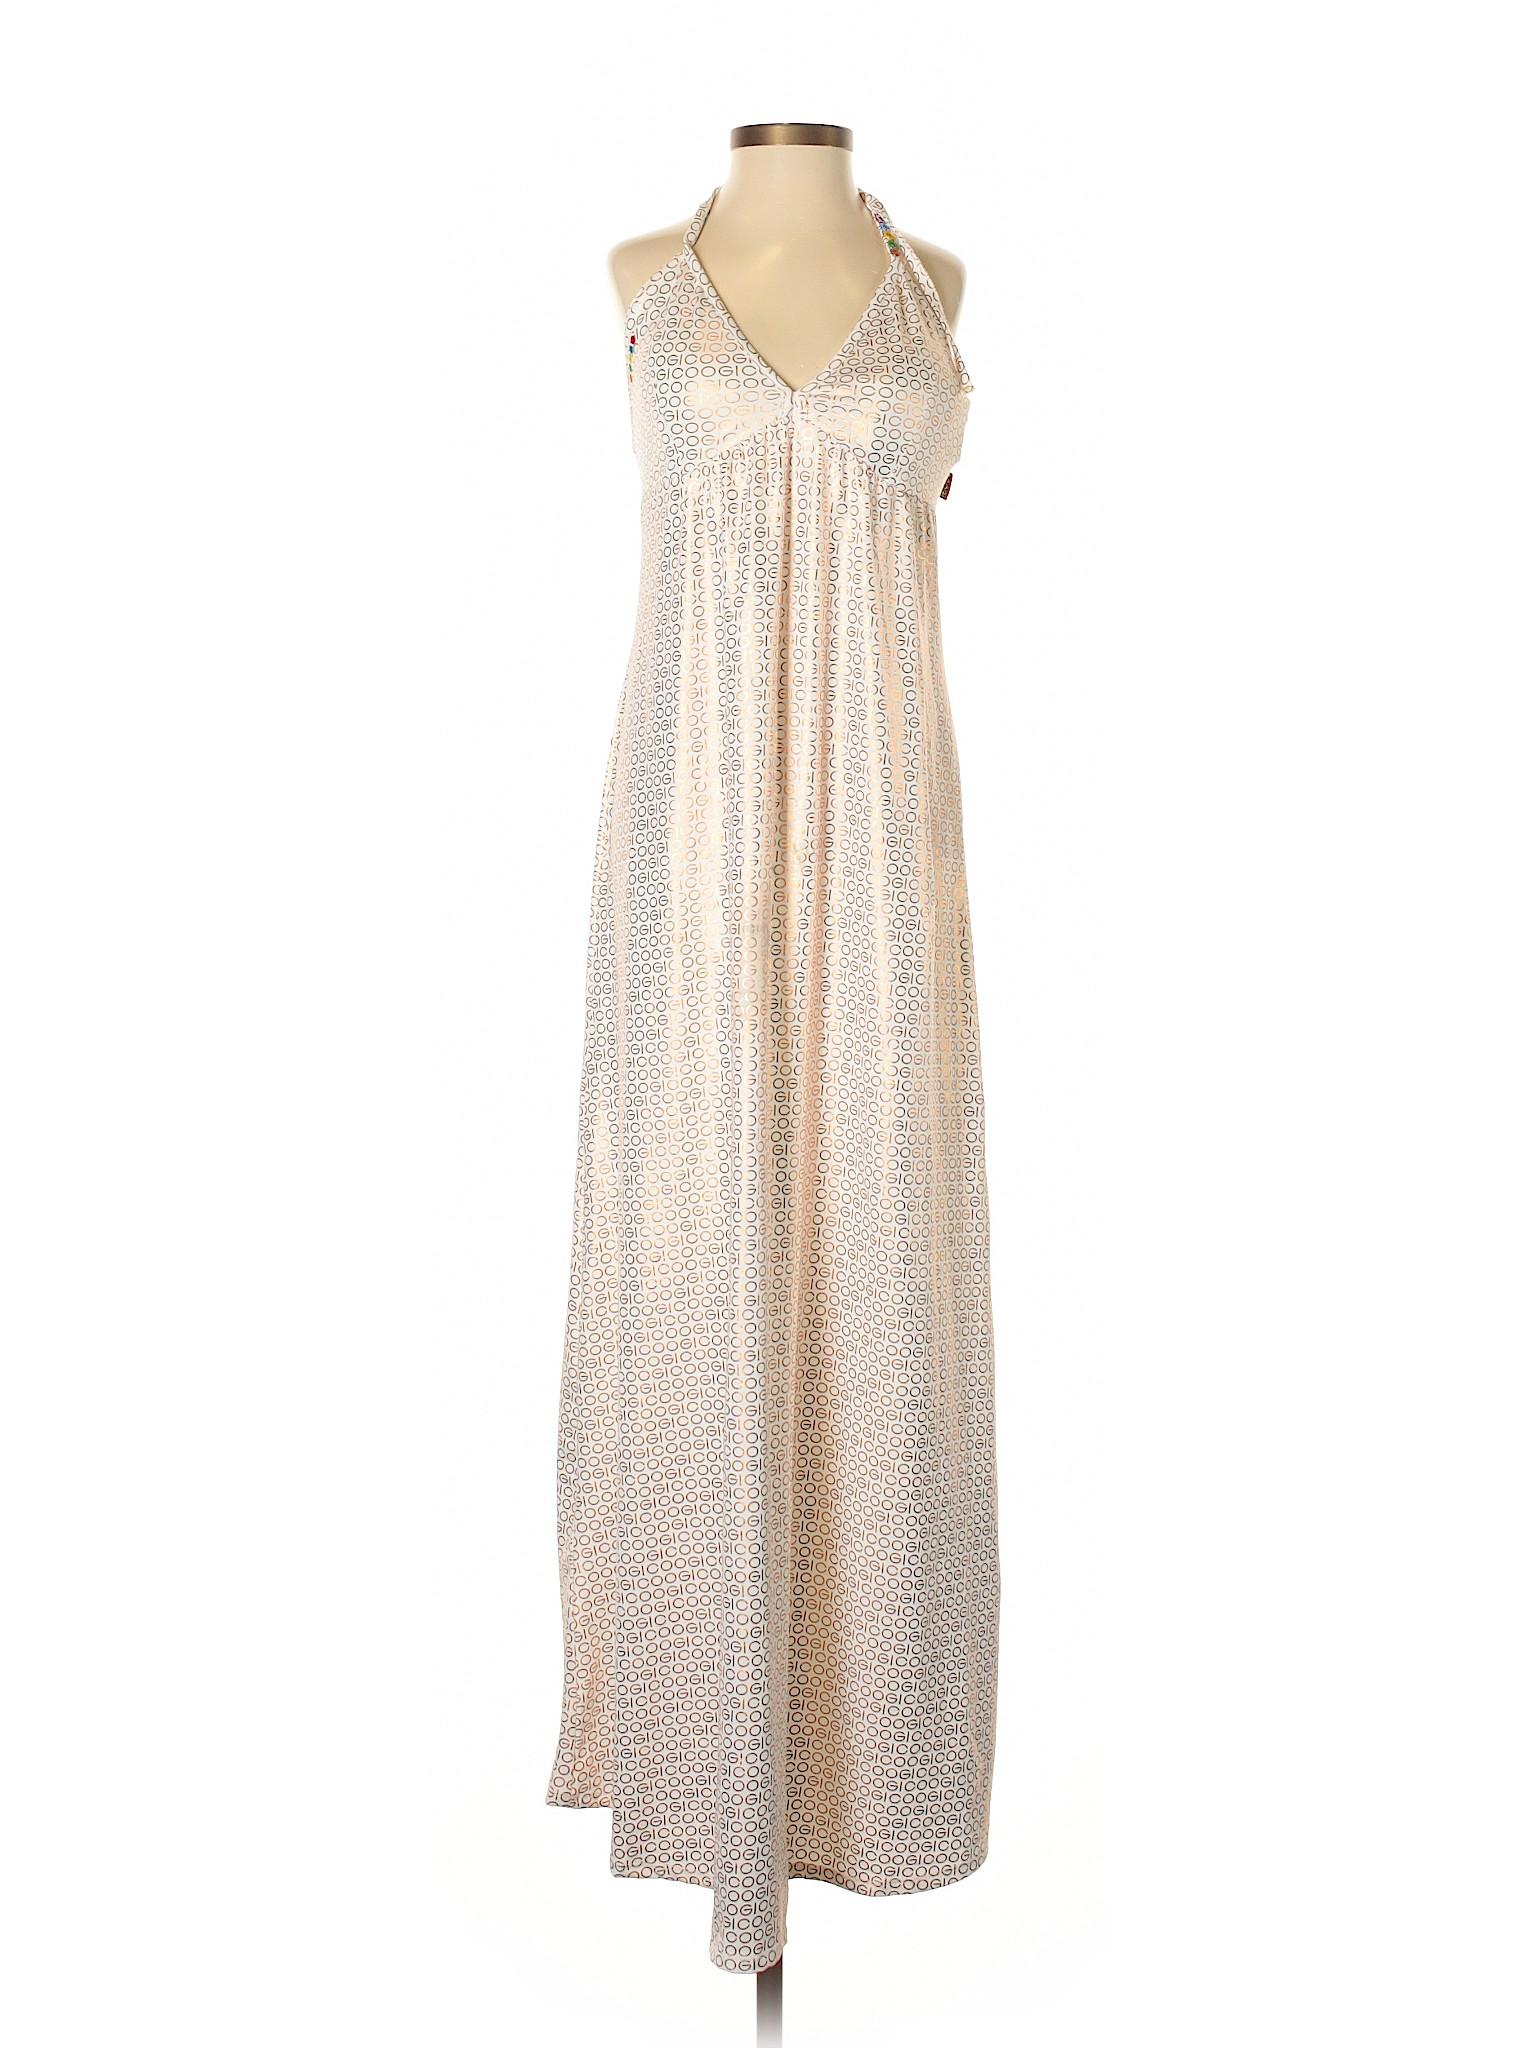 Boutique Casual Coogi Boutique winter Coogi Dress winter Casual Coogi winter Boutique Dress Dress Casual Tz7fqnAT